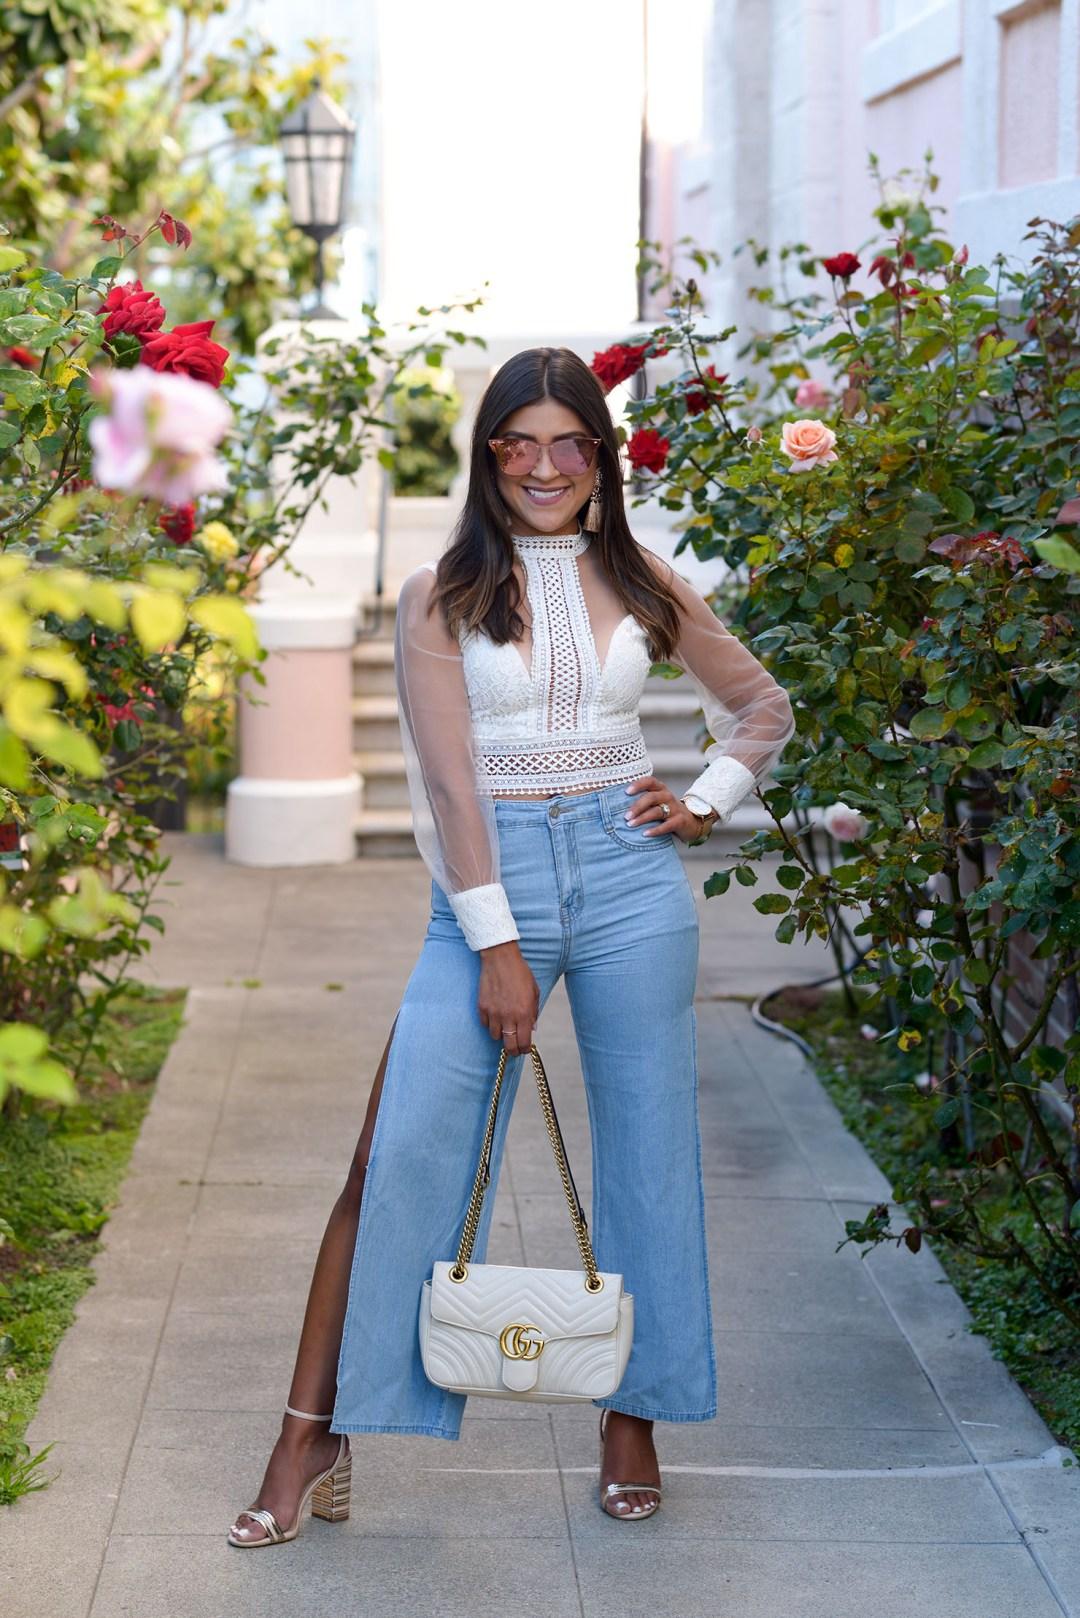 Life style blogger Kelsey Kaplan of Kelsey Kaplan Fashion wearing rose gold sunglasses and side slit jeans